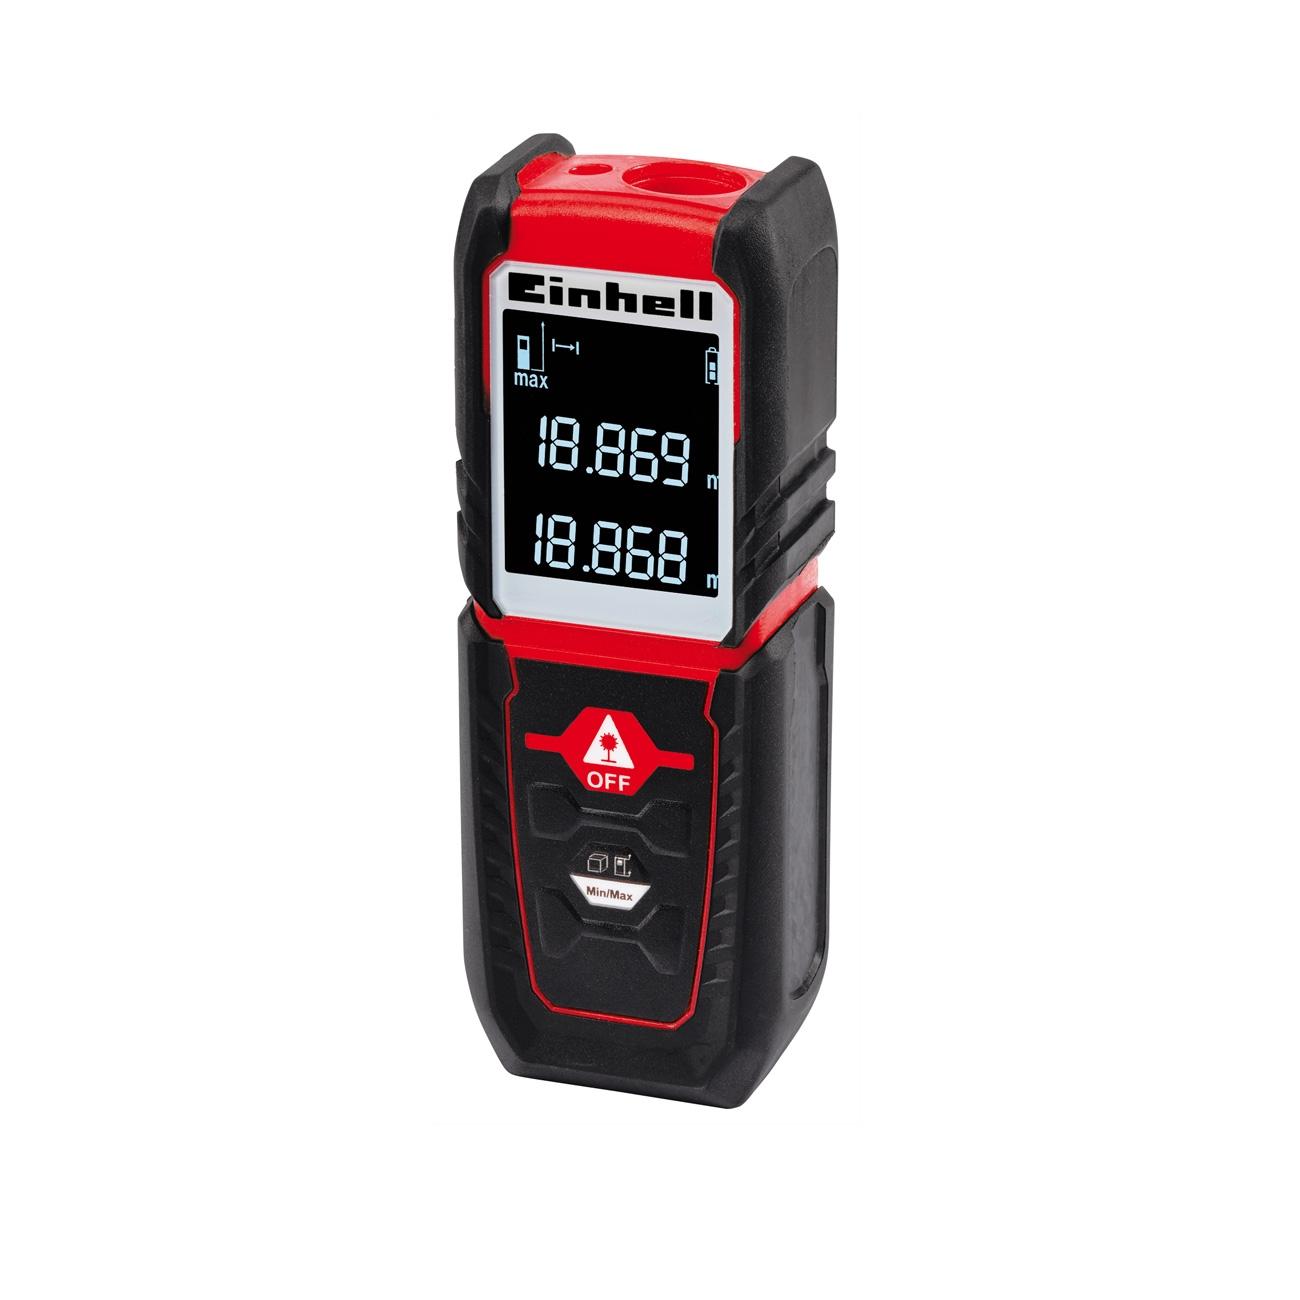 Einhell TC-LD 25 - Laser Measuring